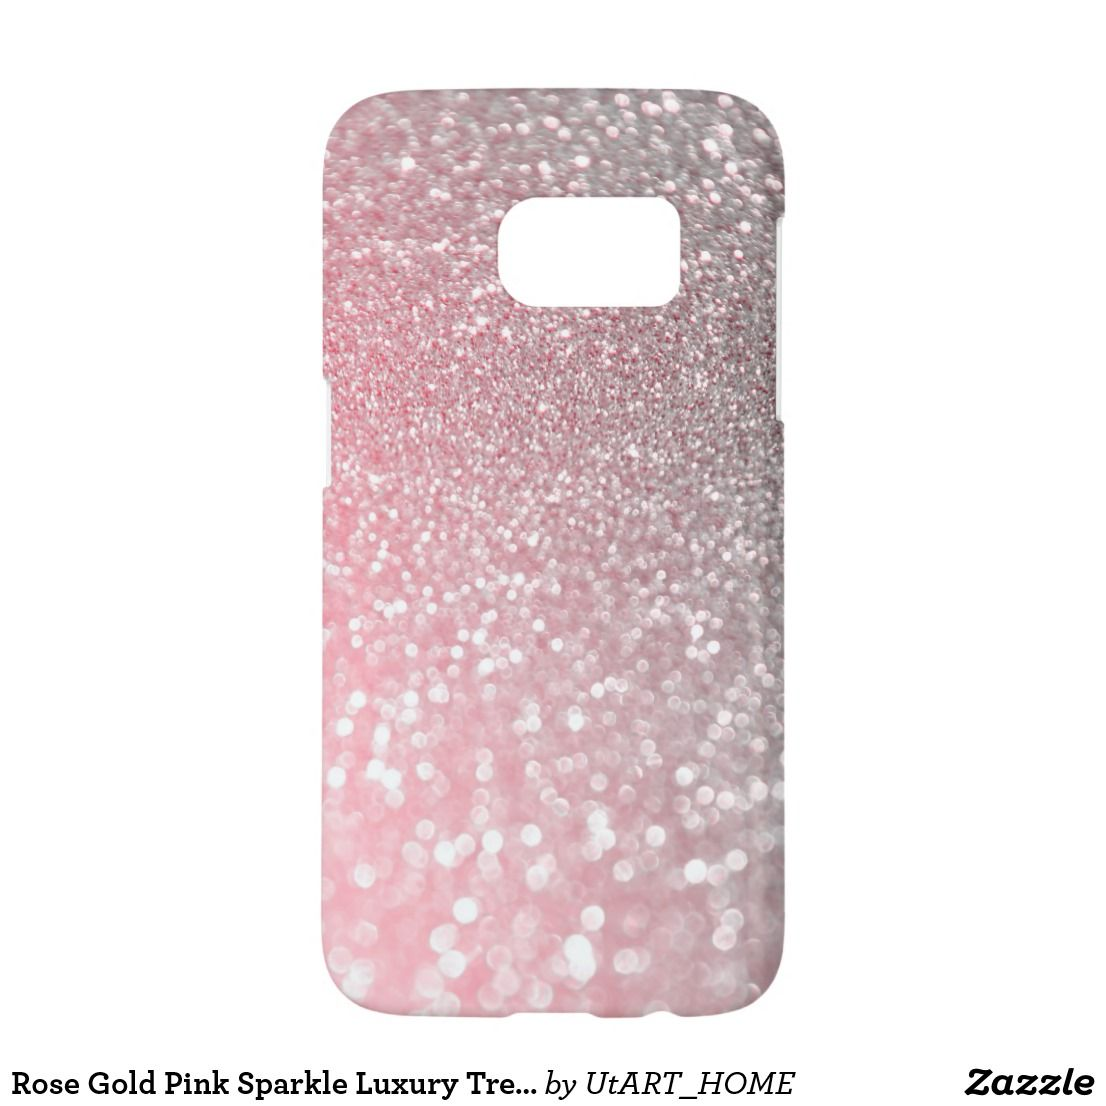 Rose Gold Pink Sparkle Luxury Trendy Glitter Case Mate Samsung Galaxy Case Zazzle Com Samsung Galaxy S7 Cases Galaxy S7 Cases Samsung Galaxy Case